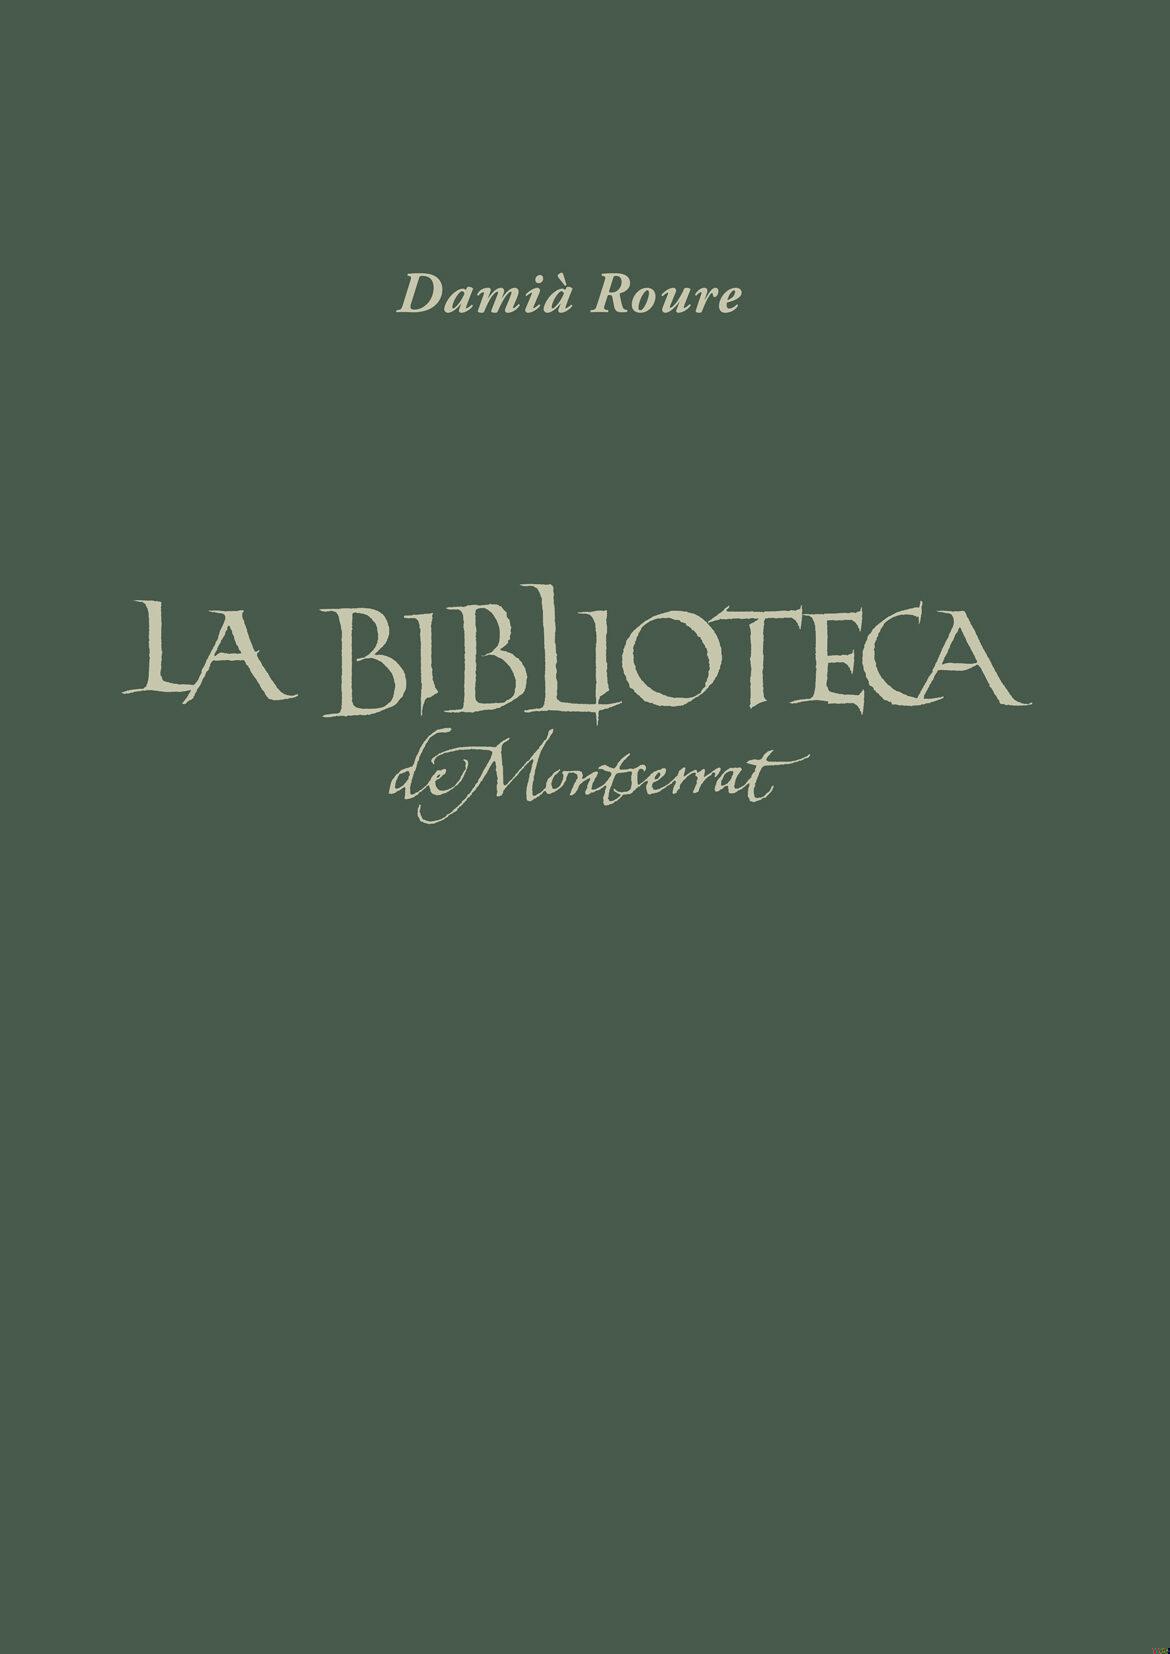 La Biblioteca De Montserrat: Un Espai De Cultura Al Llarg Dels Se Gles por Damia Roure epub